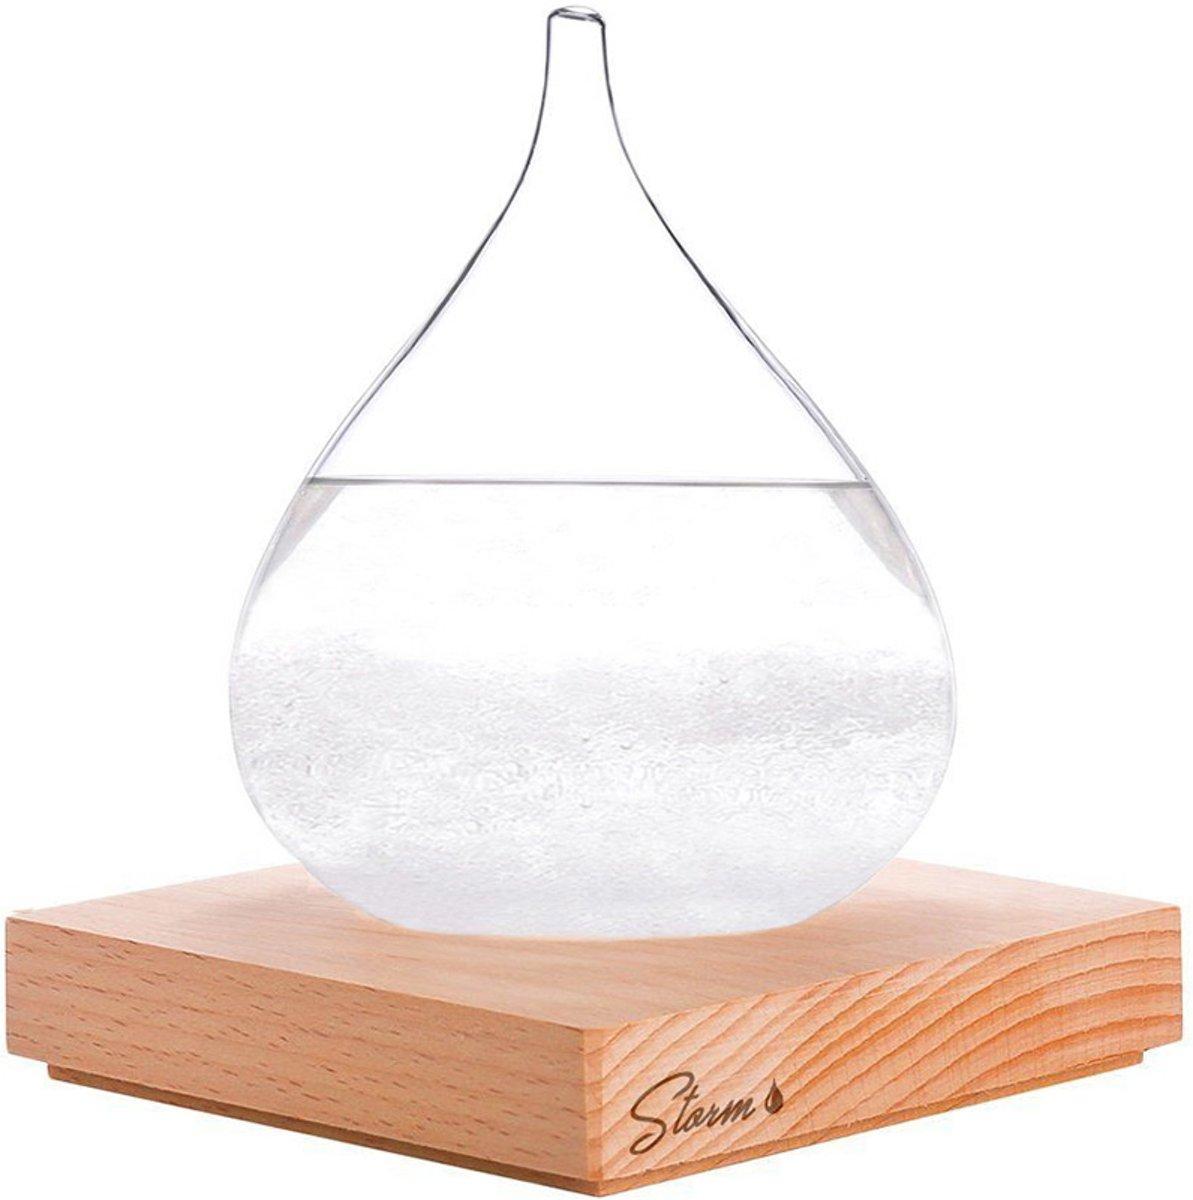 MikaMax - Stormglas small - Barometer kopen